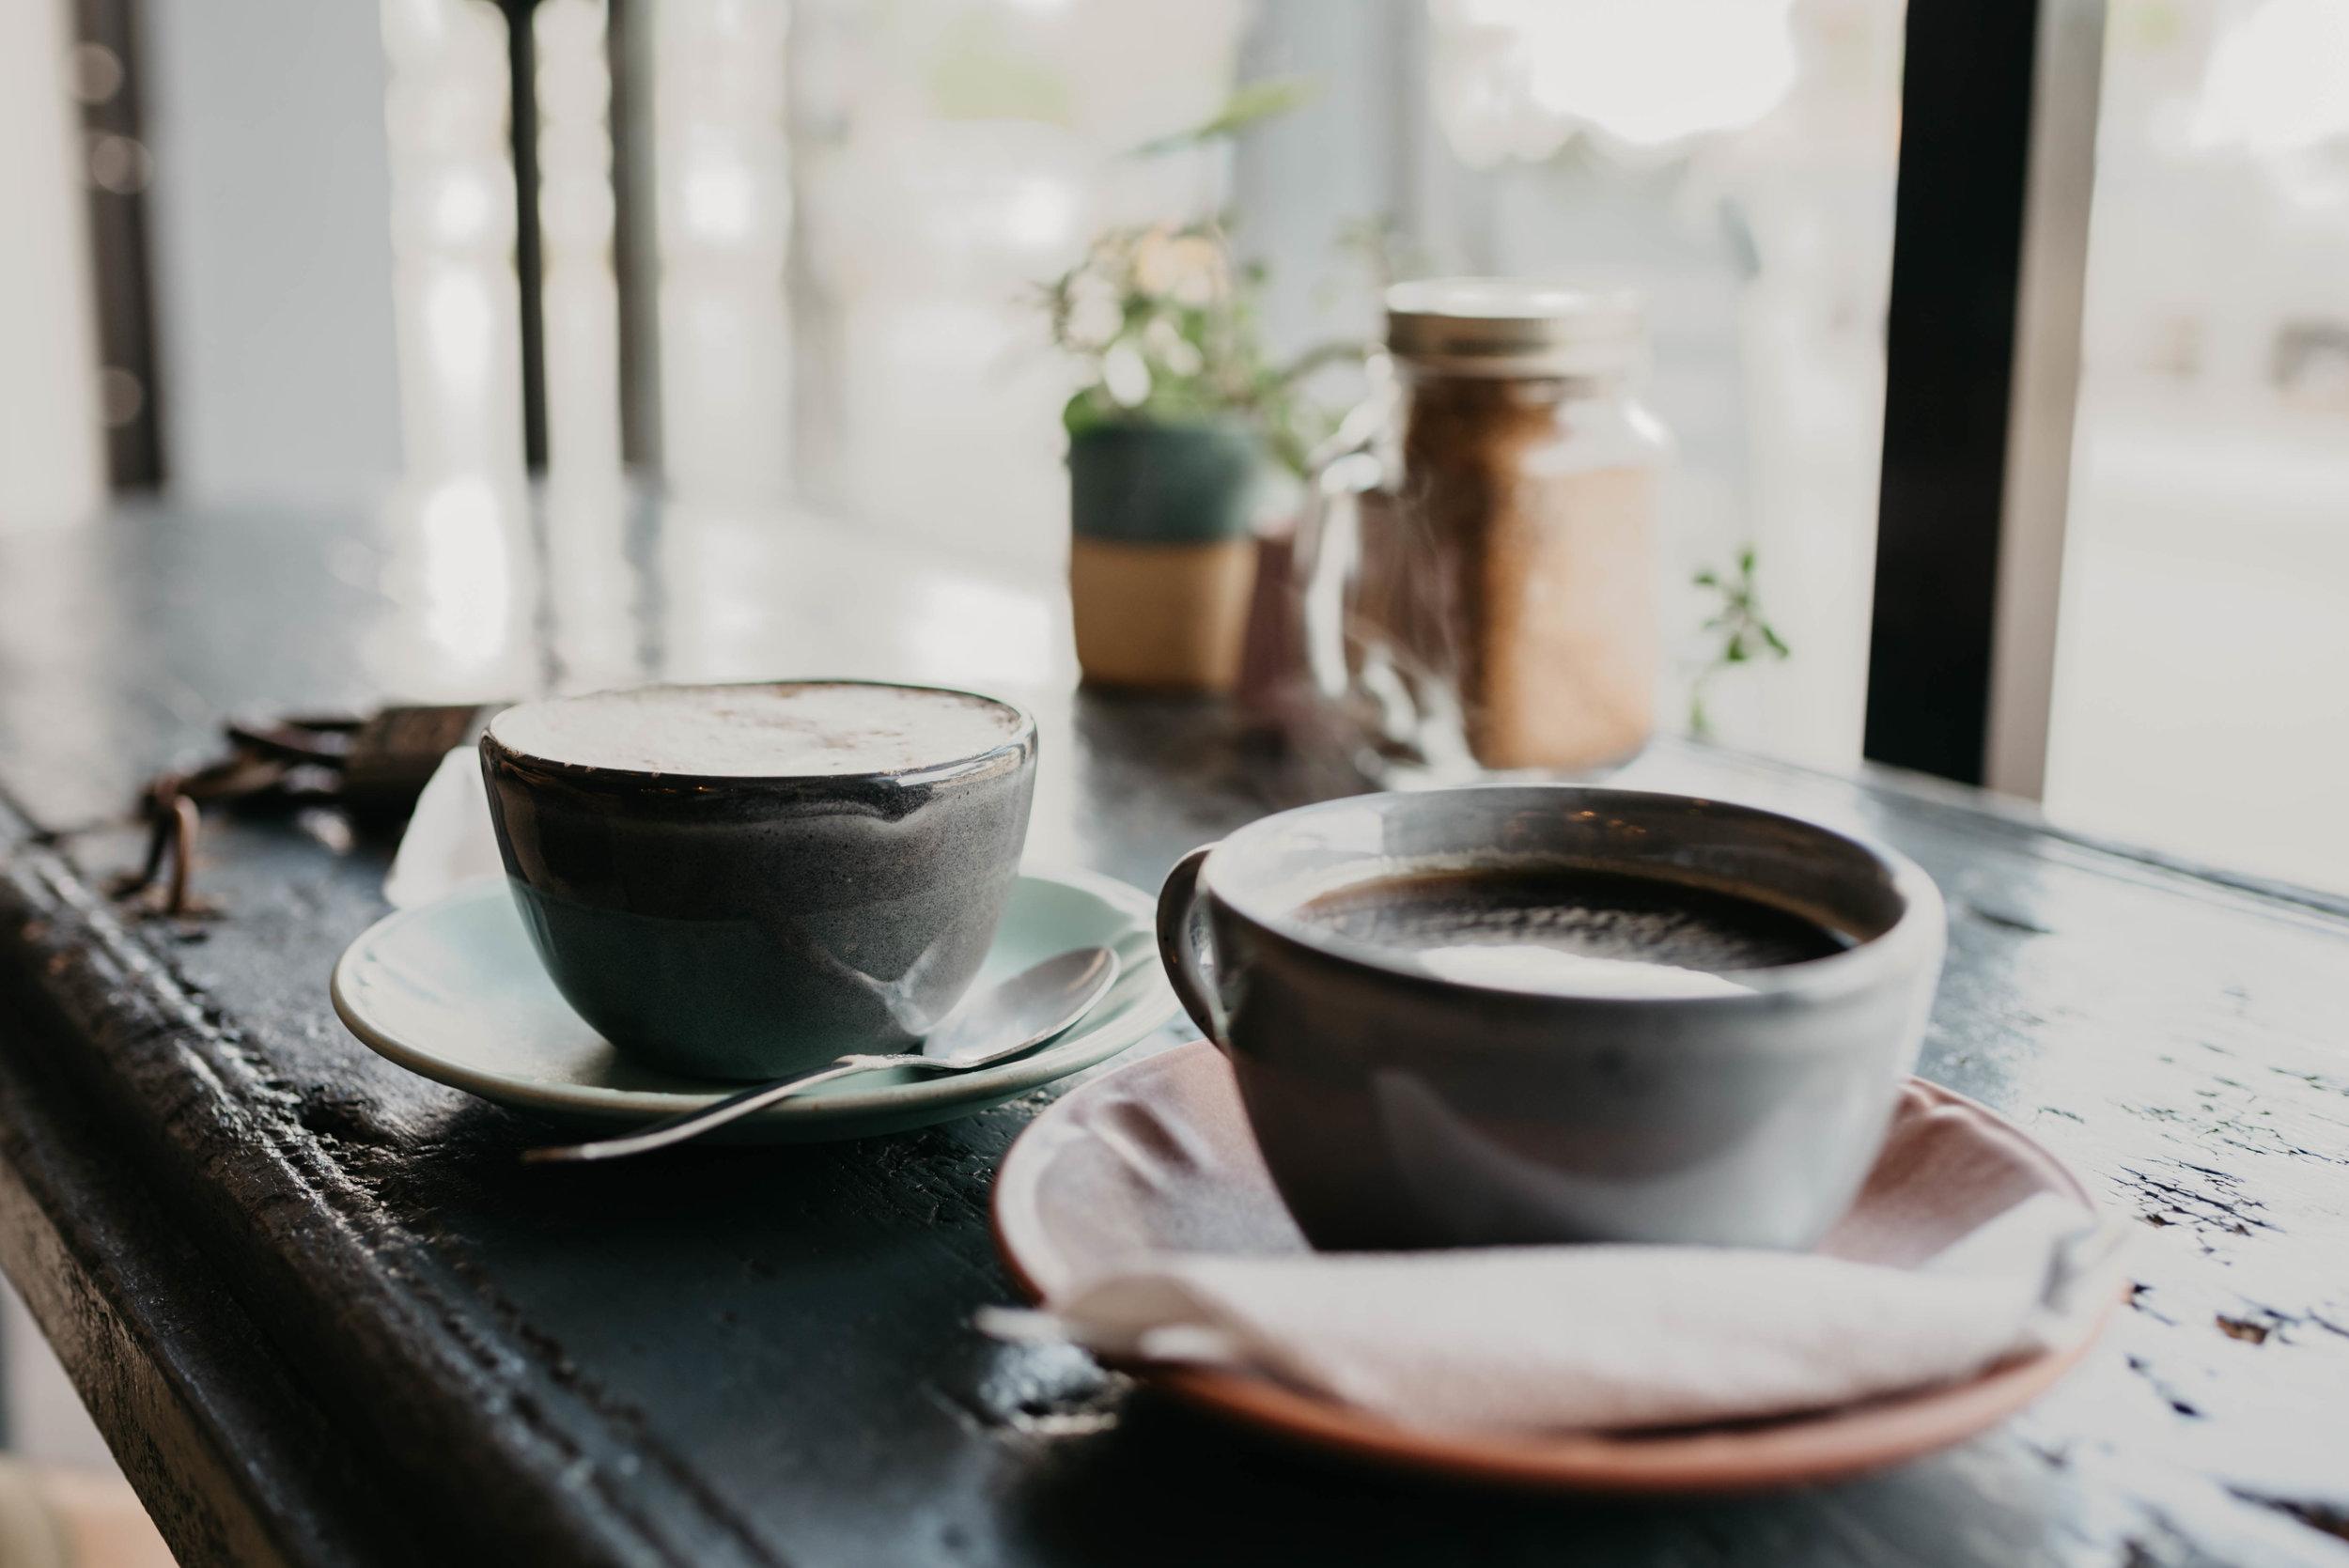 Afternoon coffee(s) at Prieto Tulum.